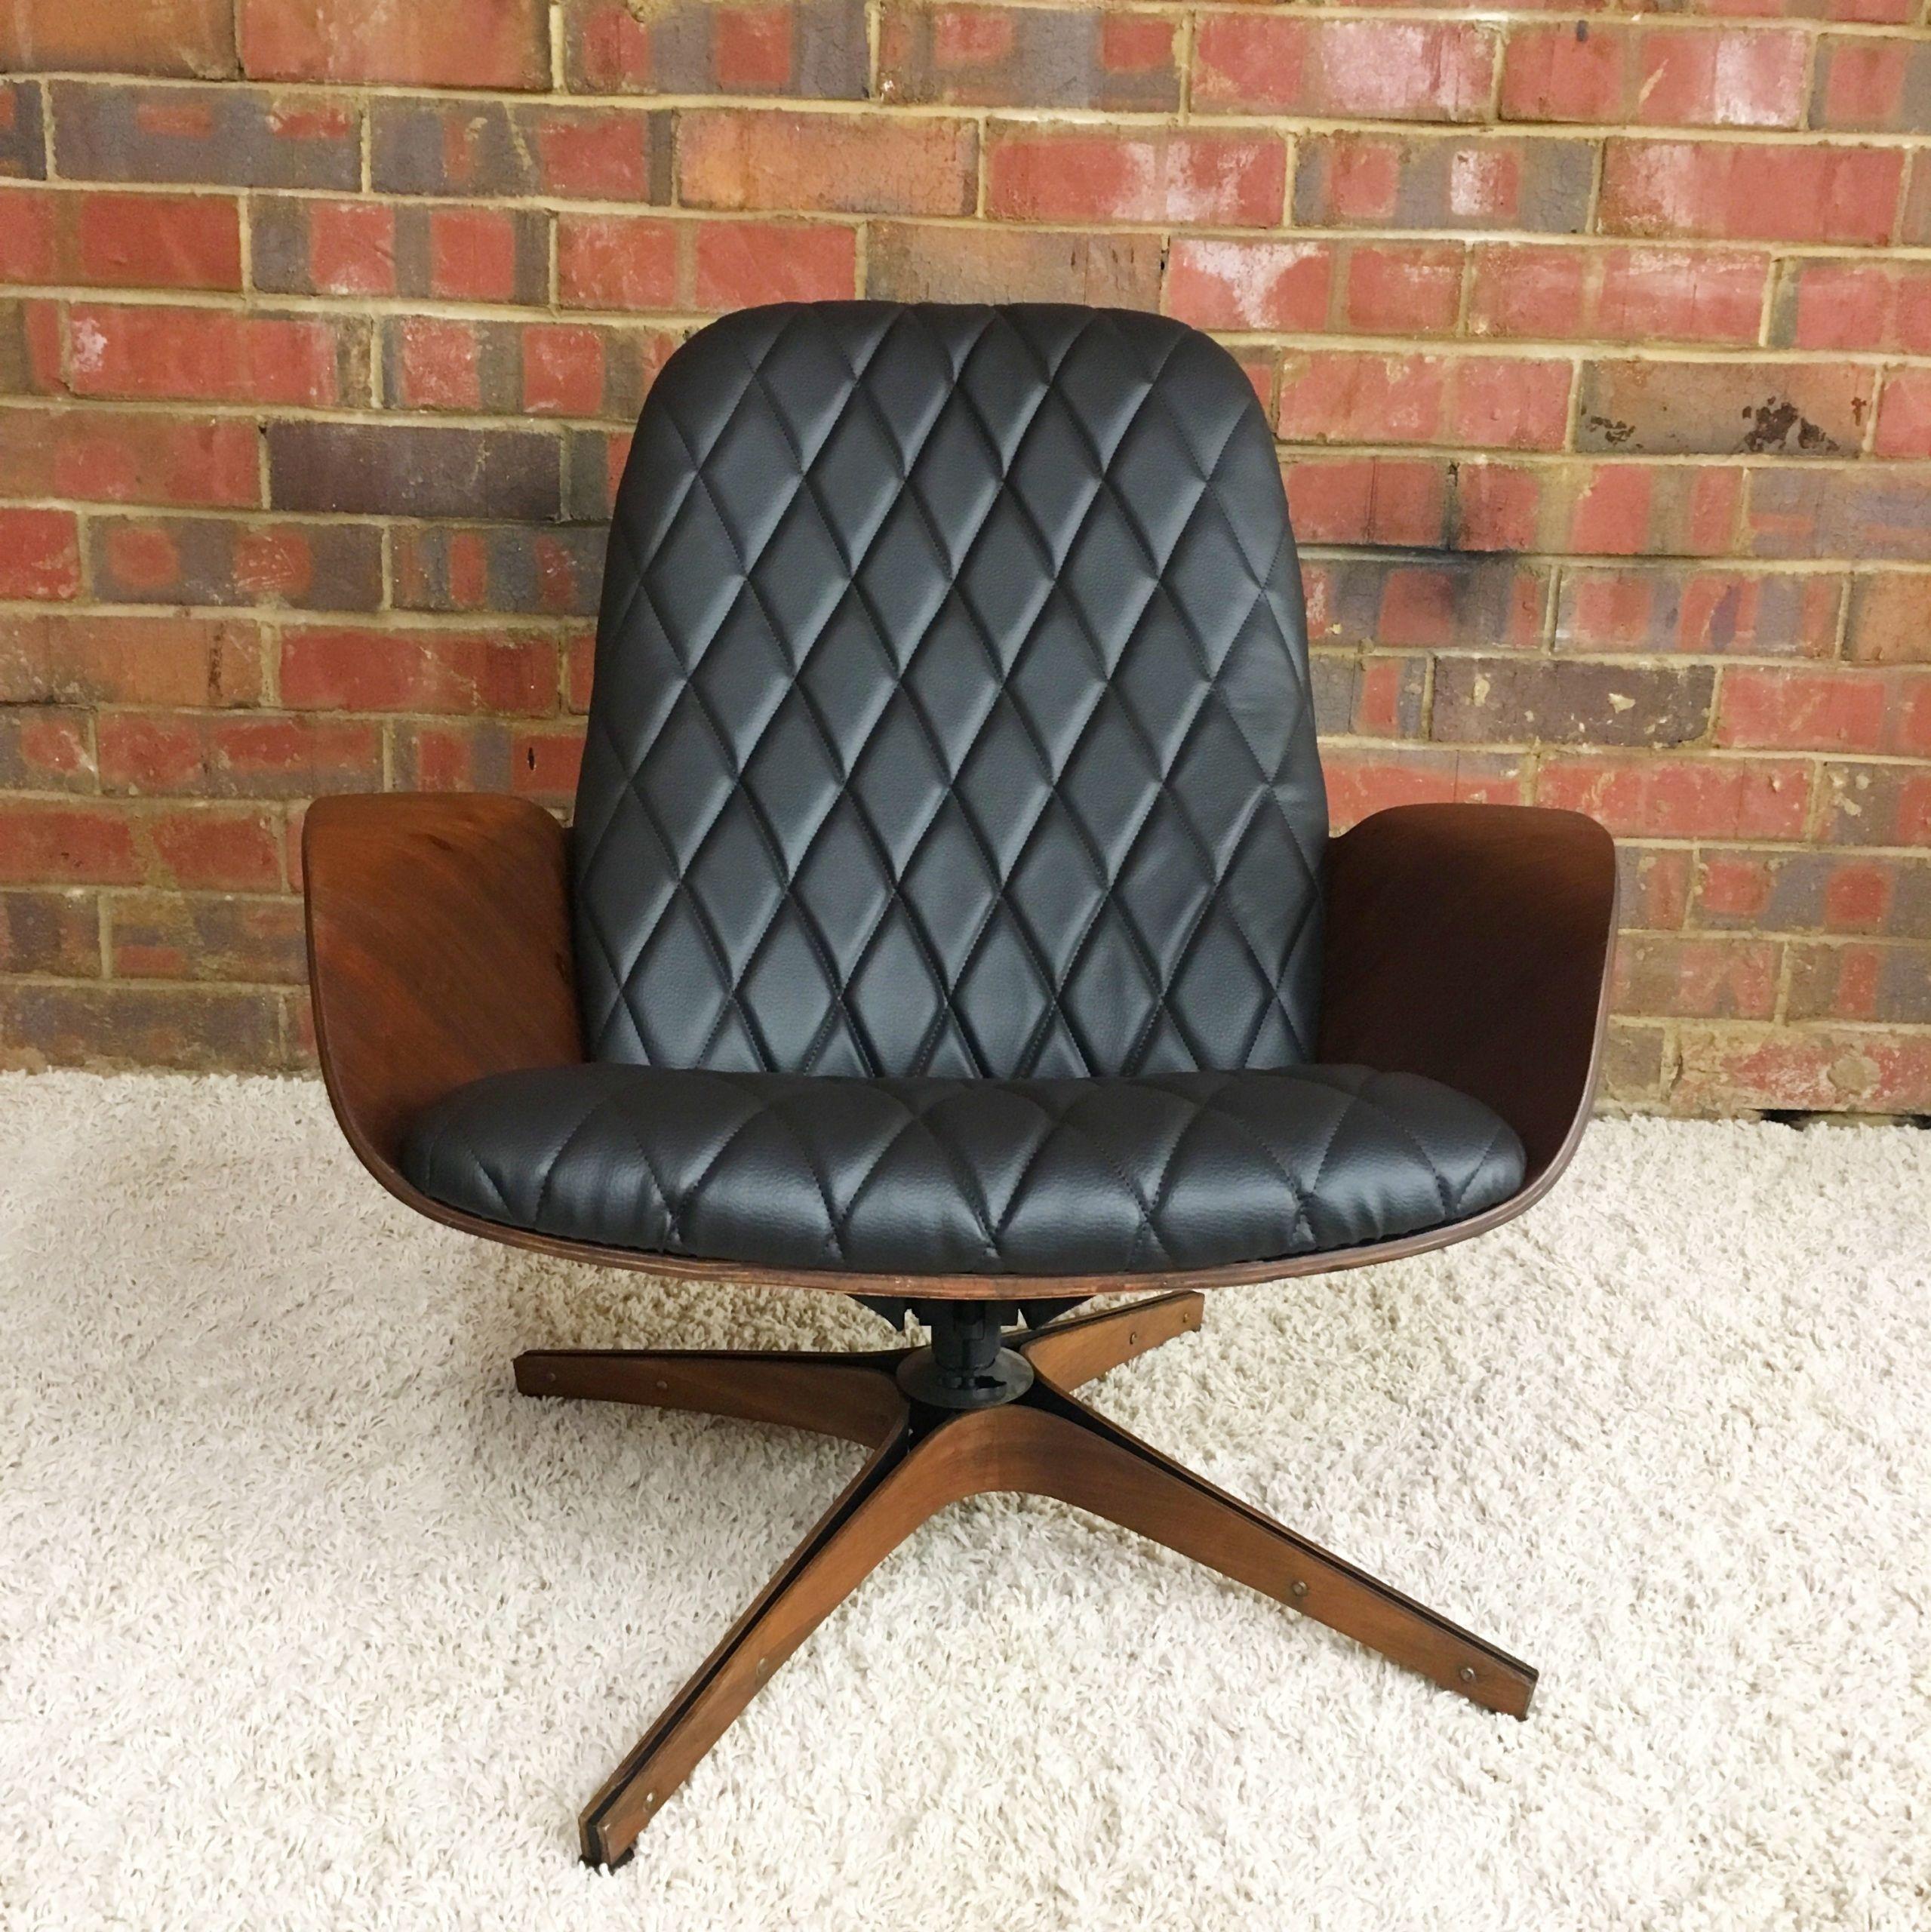 Mid century modern furniture charlotte nc mid century modern real estate marketing vintage retro danish modern furniture